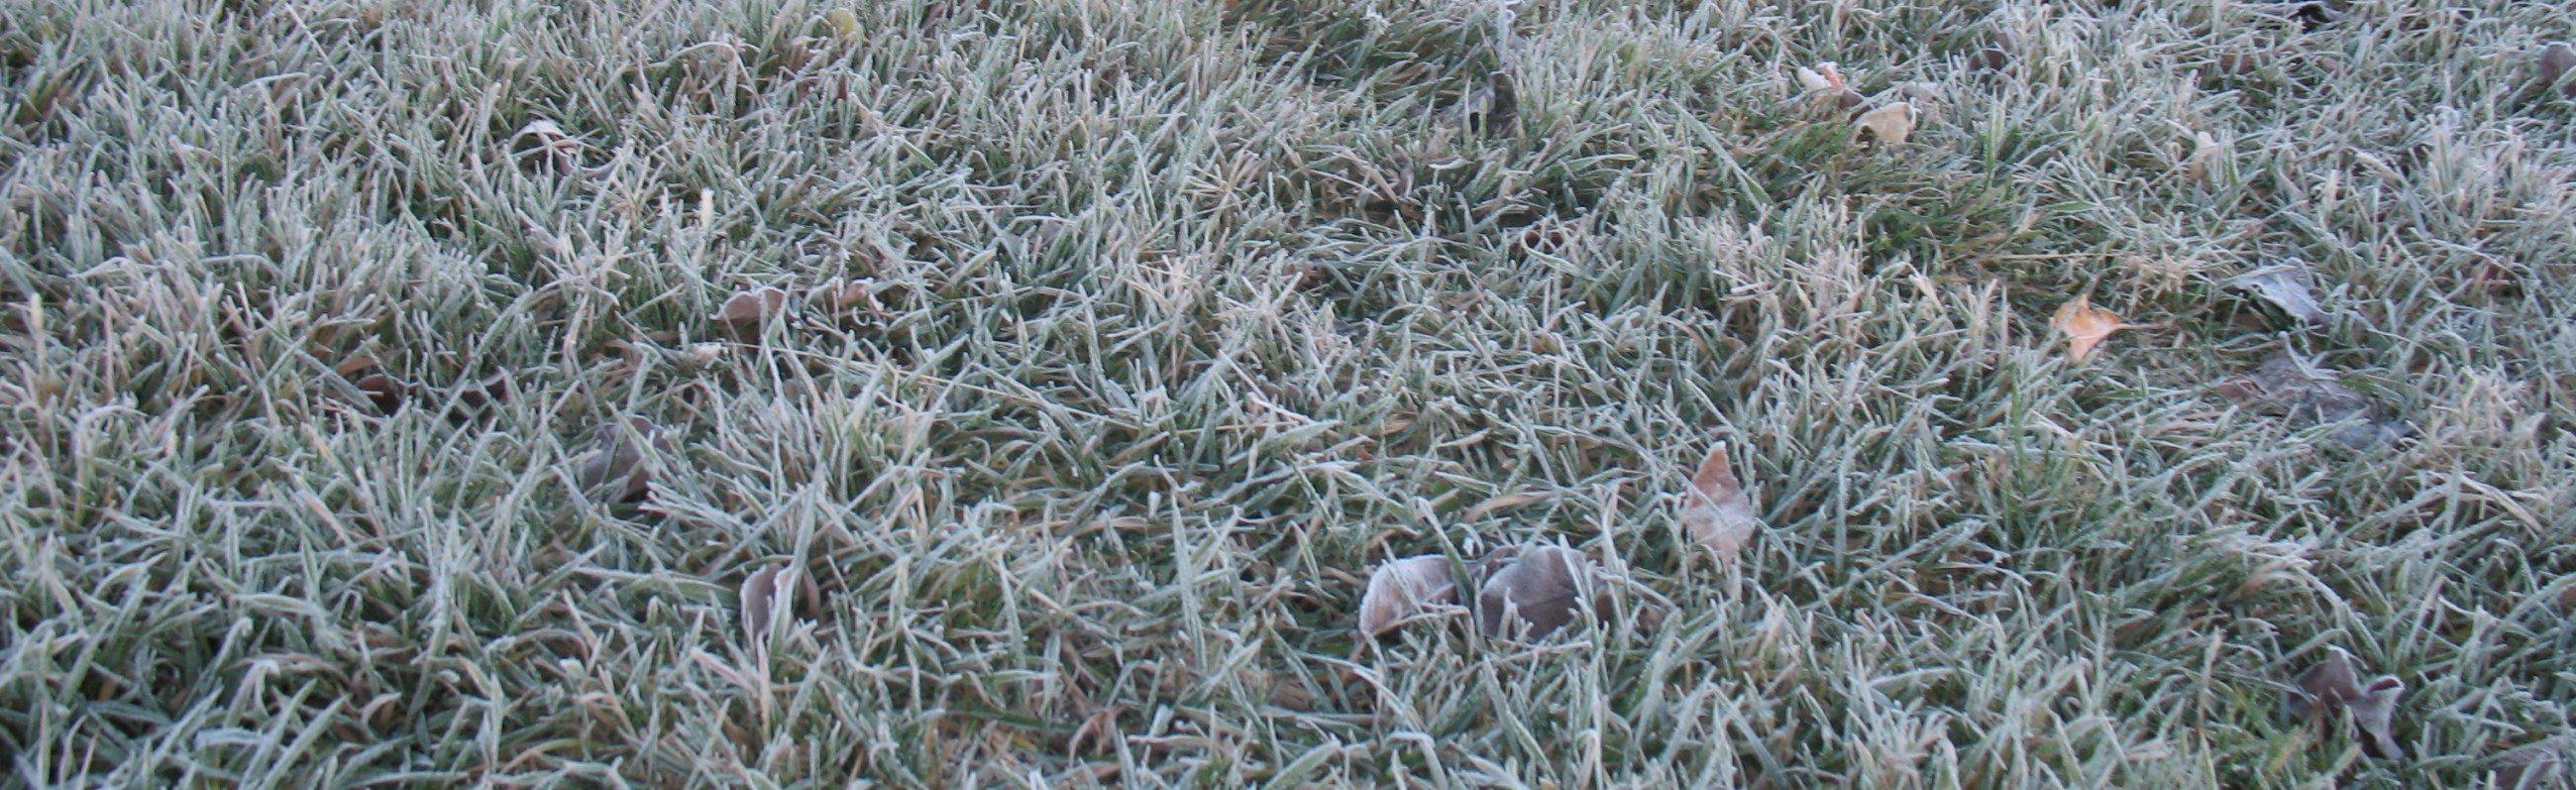 fts frosty grass